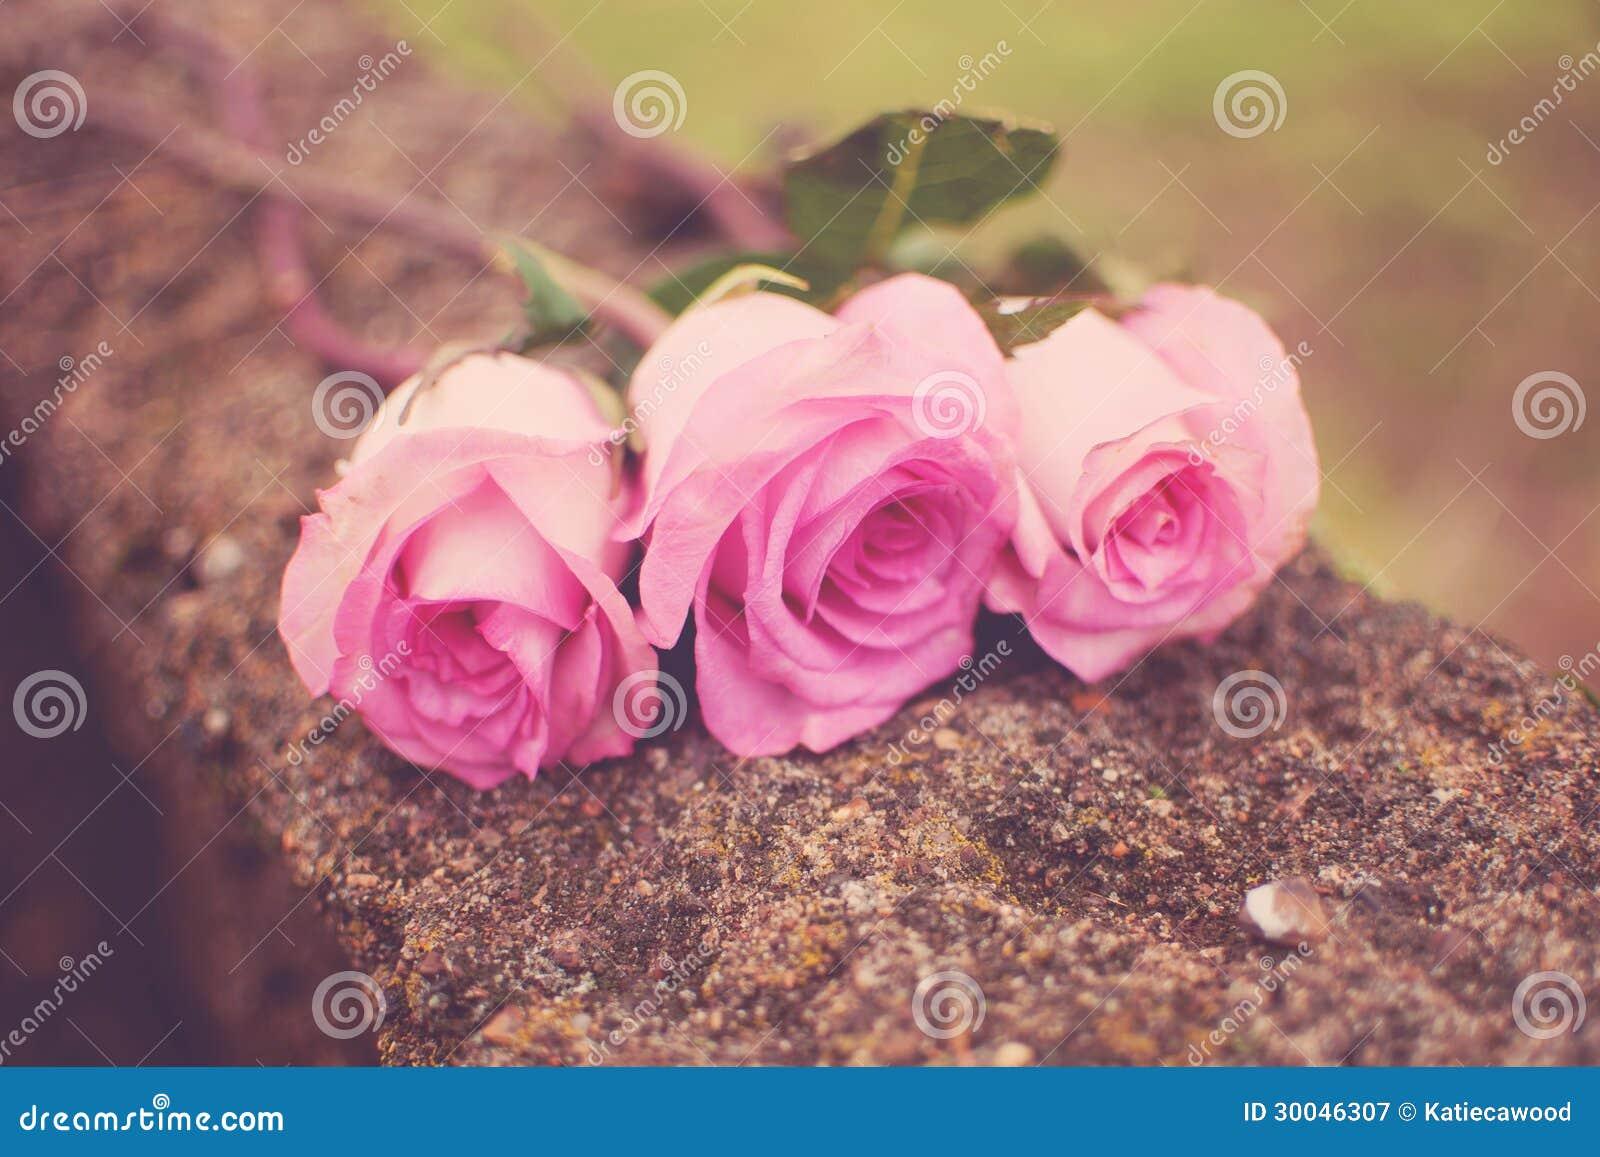 Download Three Roses stock image. Image of spring, gardening, roses - 30046307